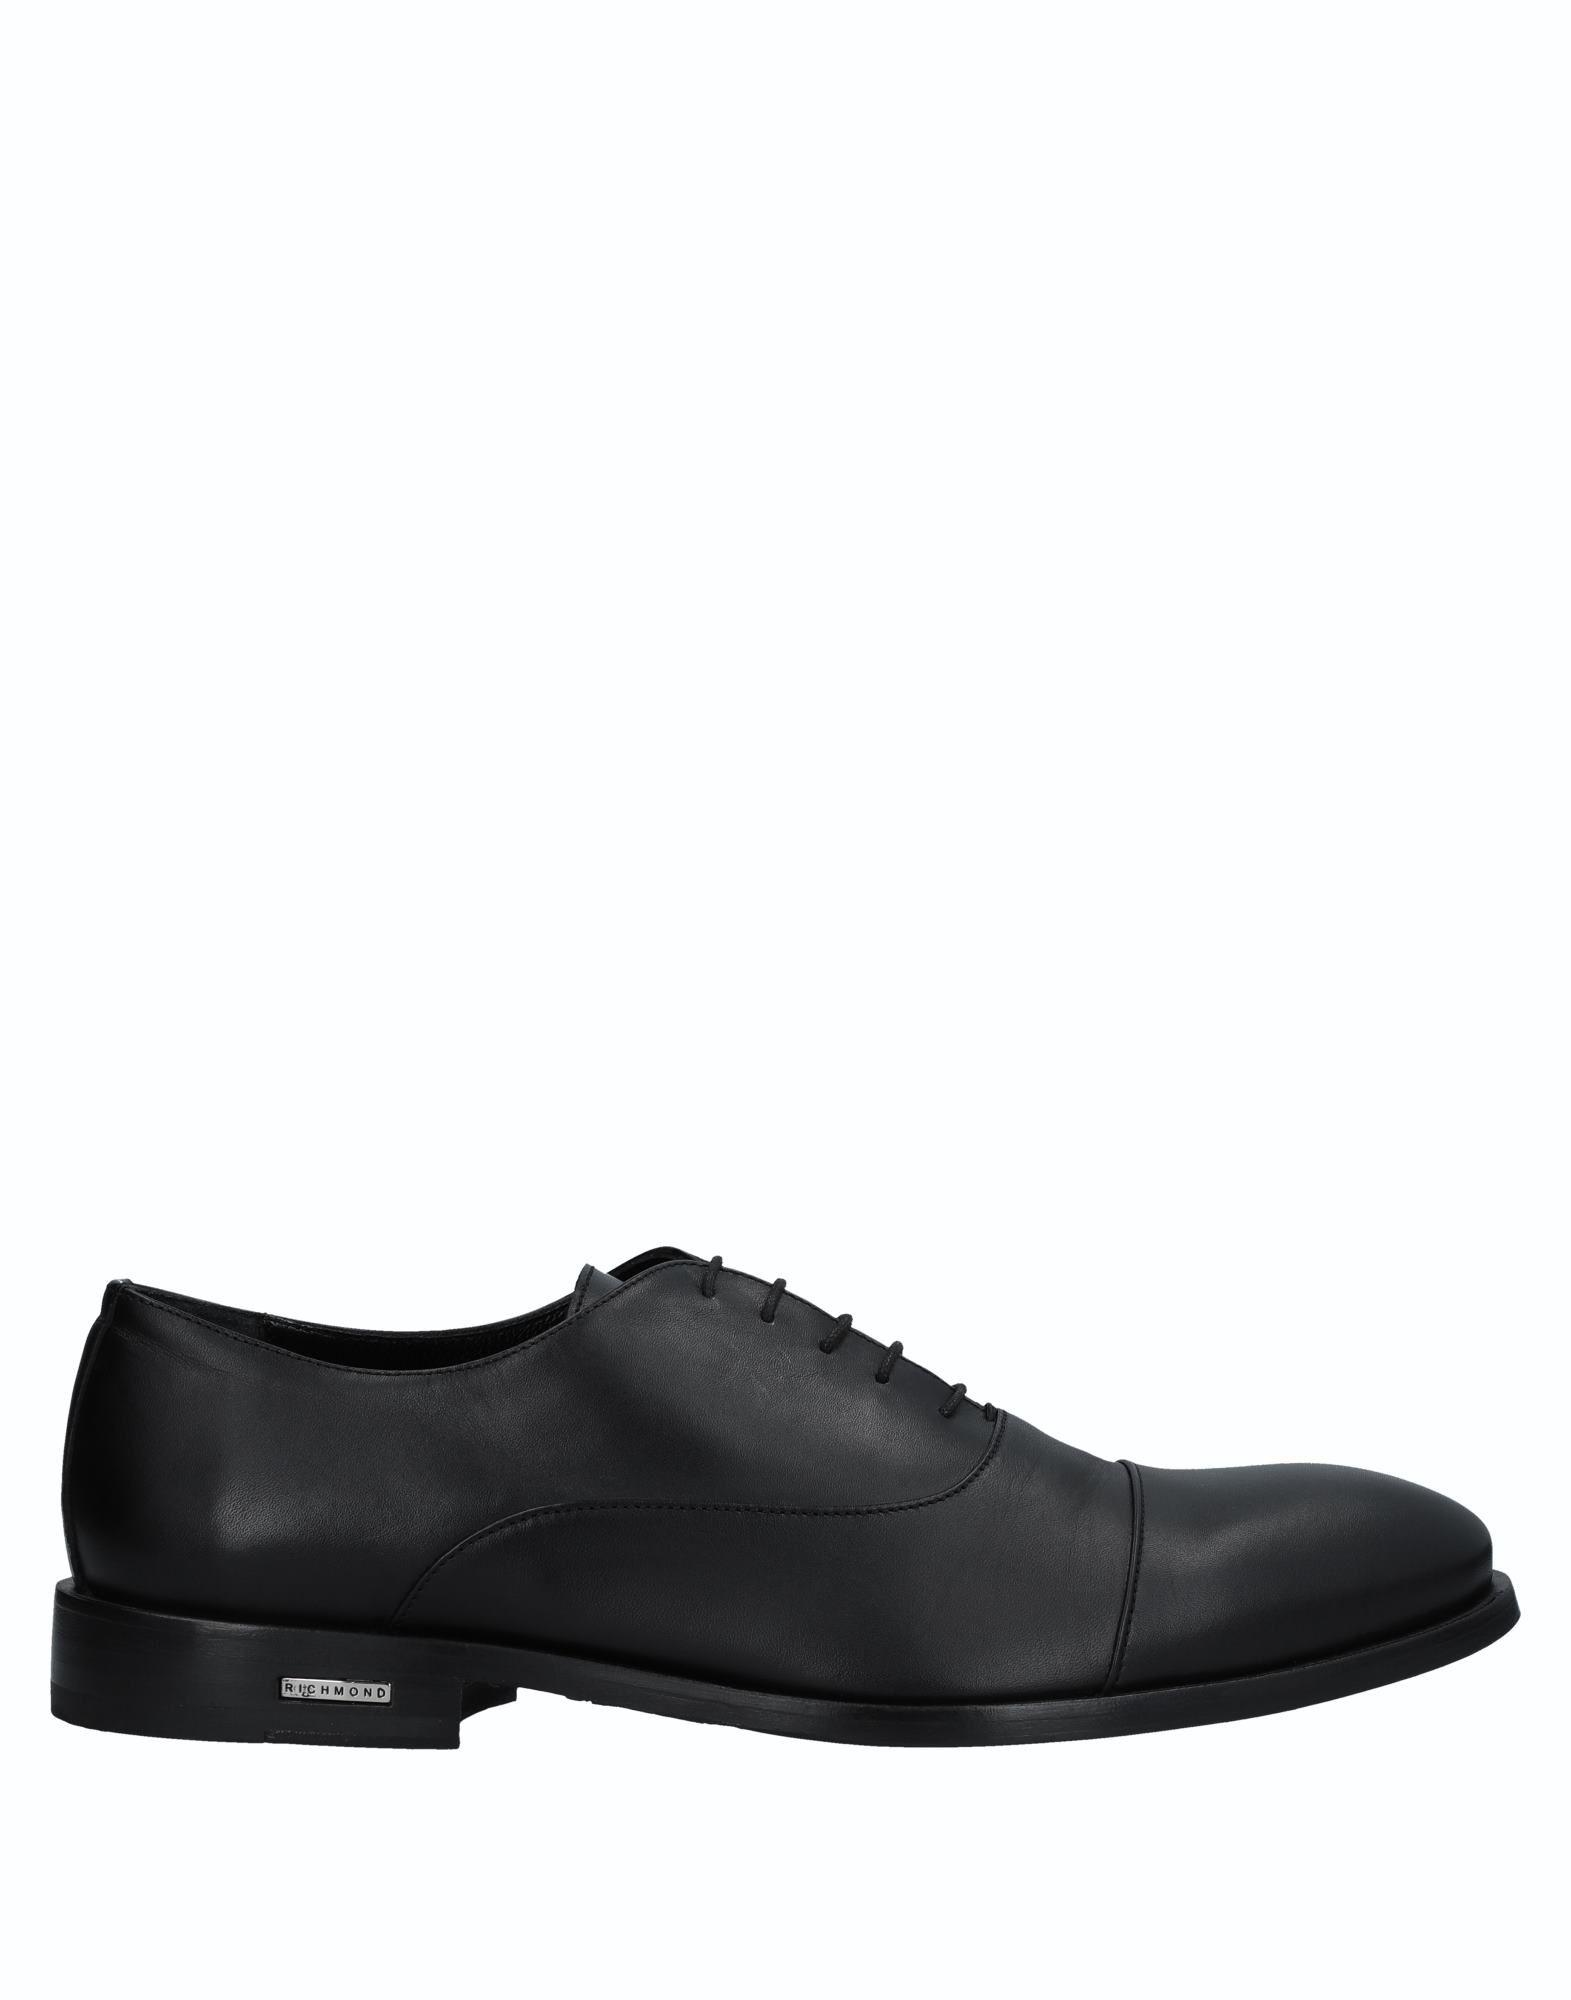 Richmond Schnürschuhe Schuhe Herren  11523326SP Heiße Schuhe Schnürschuhe 0890d7